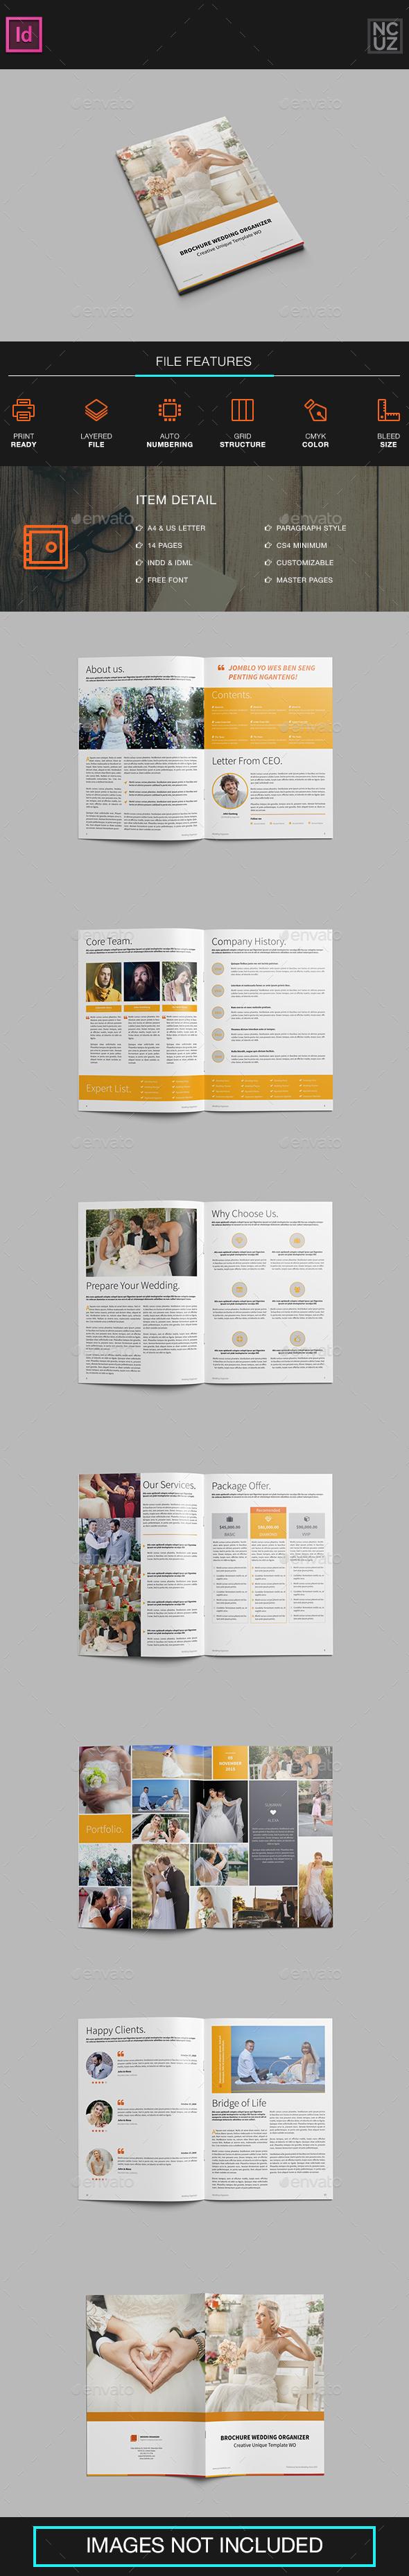 Brochure Wedding Organizer - Corporate Brochures